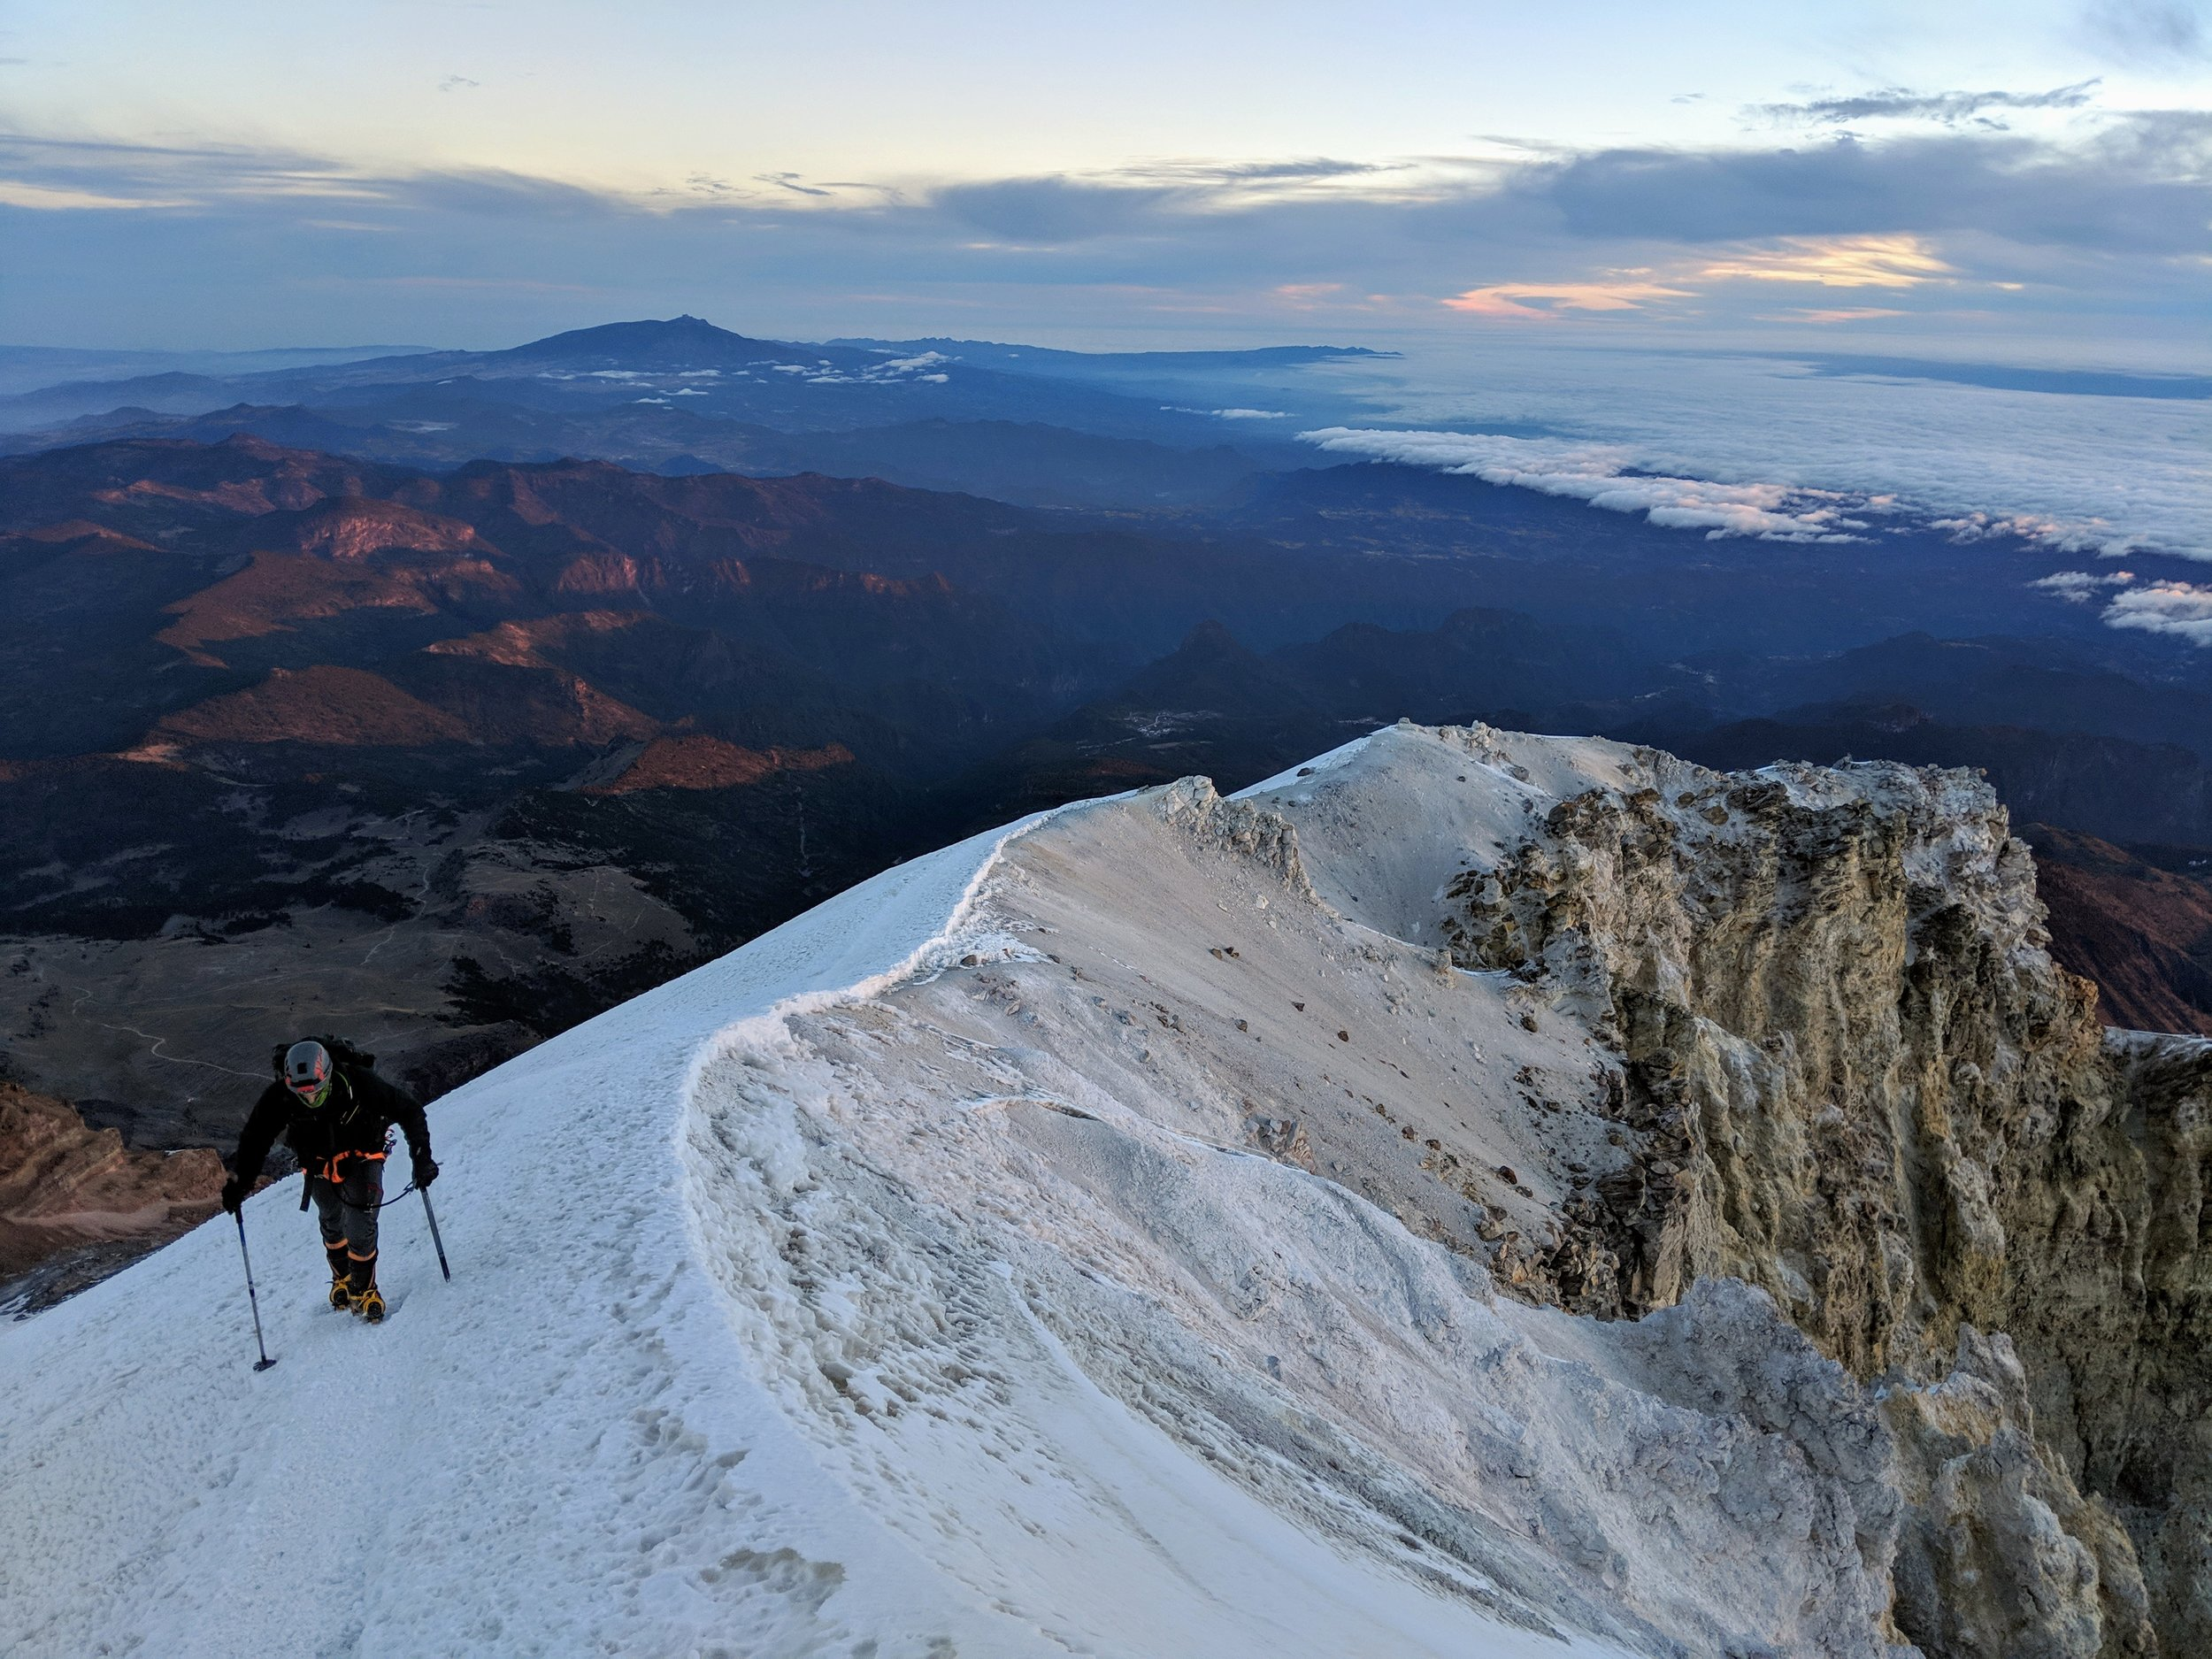 On the Ridgeline summit of Pico de Orizaba.